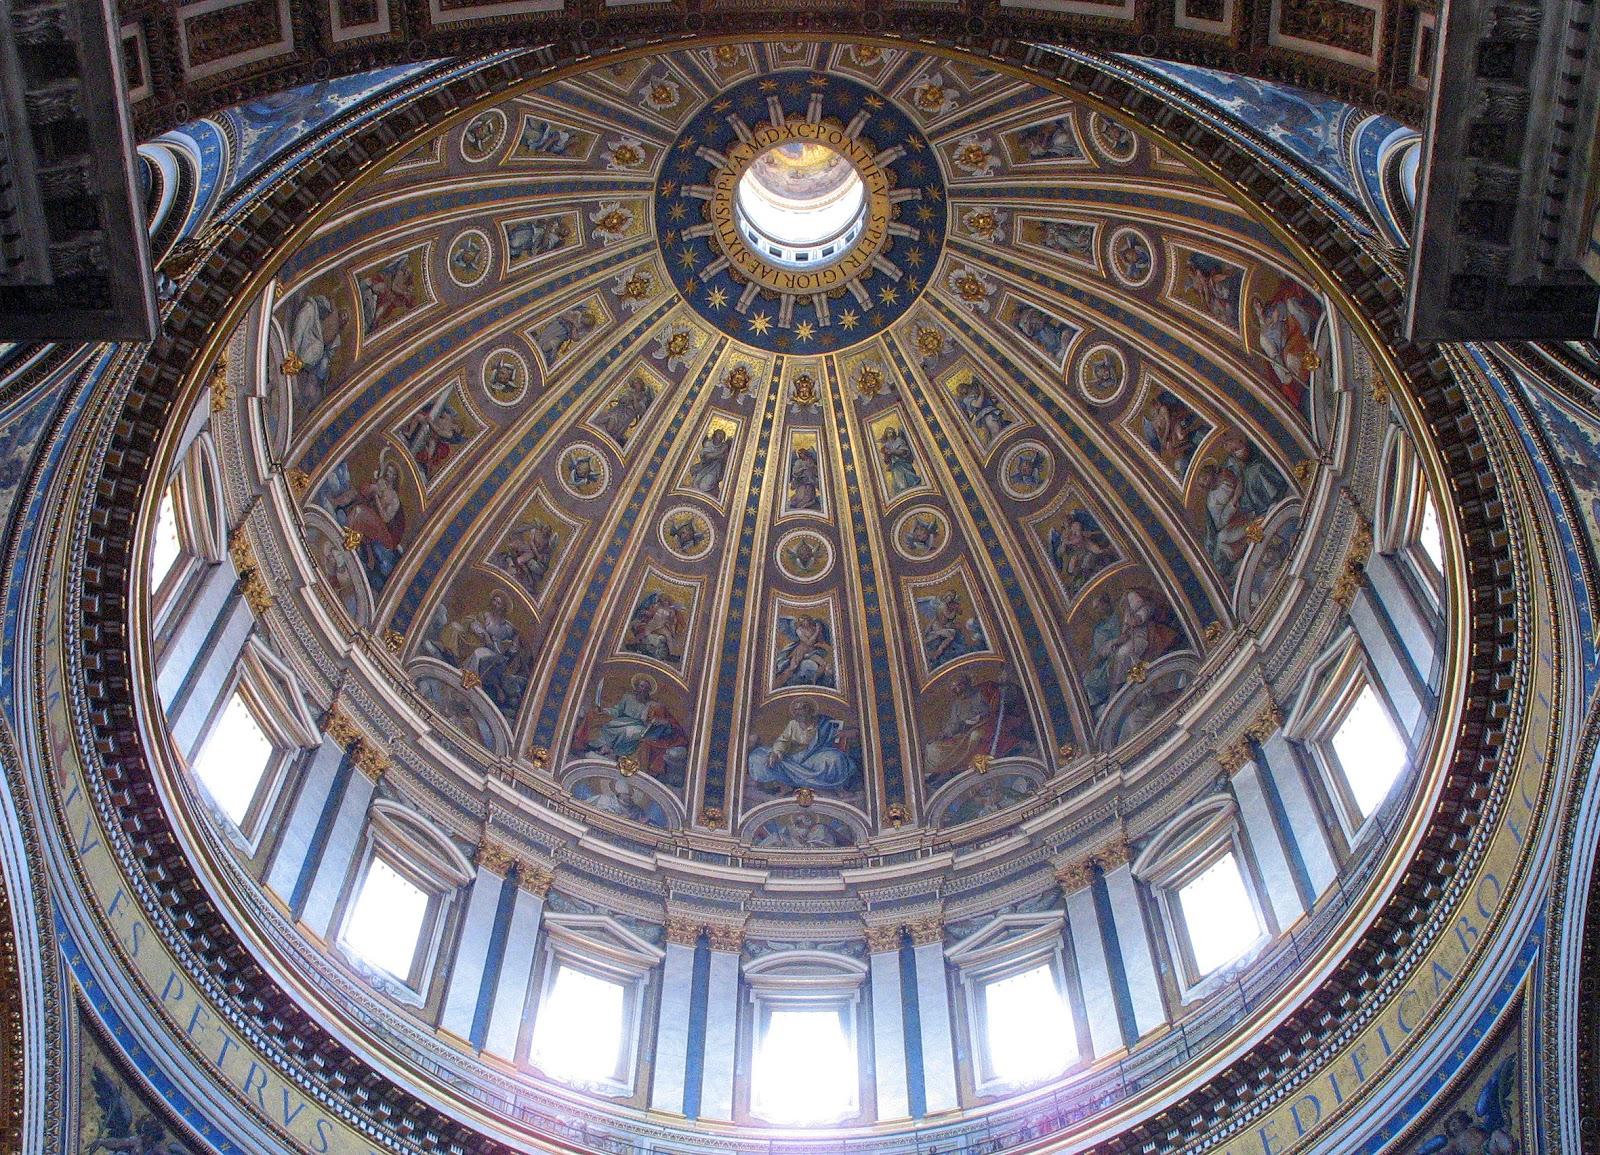 Arquitectura del cinquecento historia del arte - Arquitectura miguel angel ...